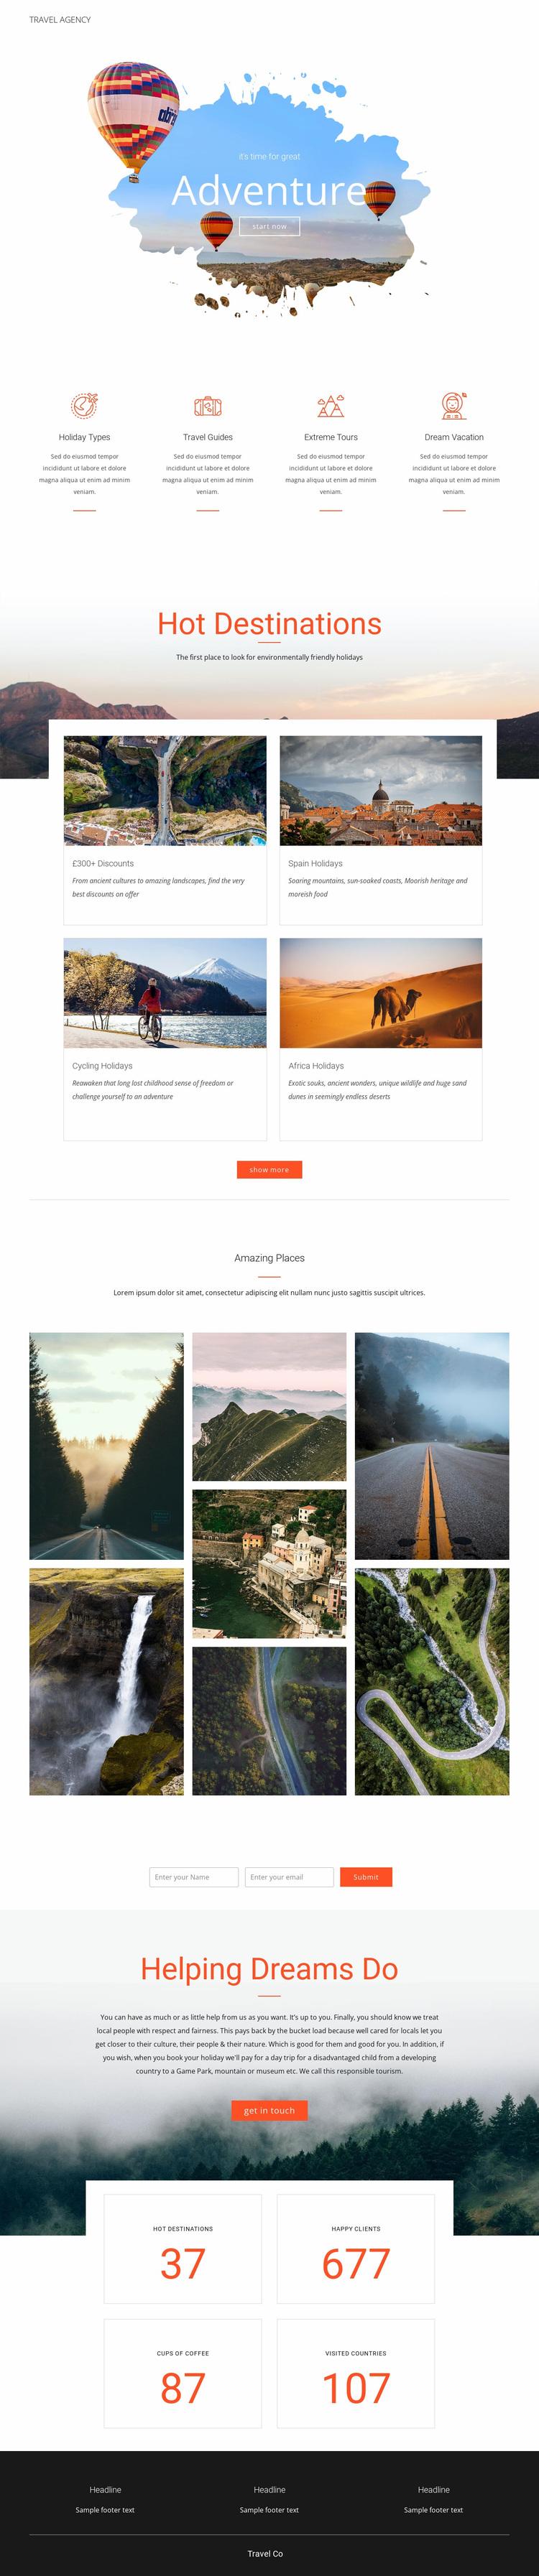 Adventure tours and travel Website Design